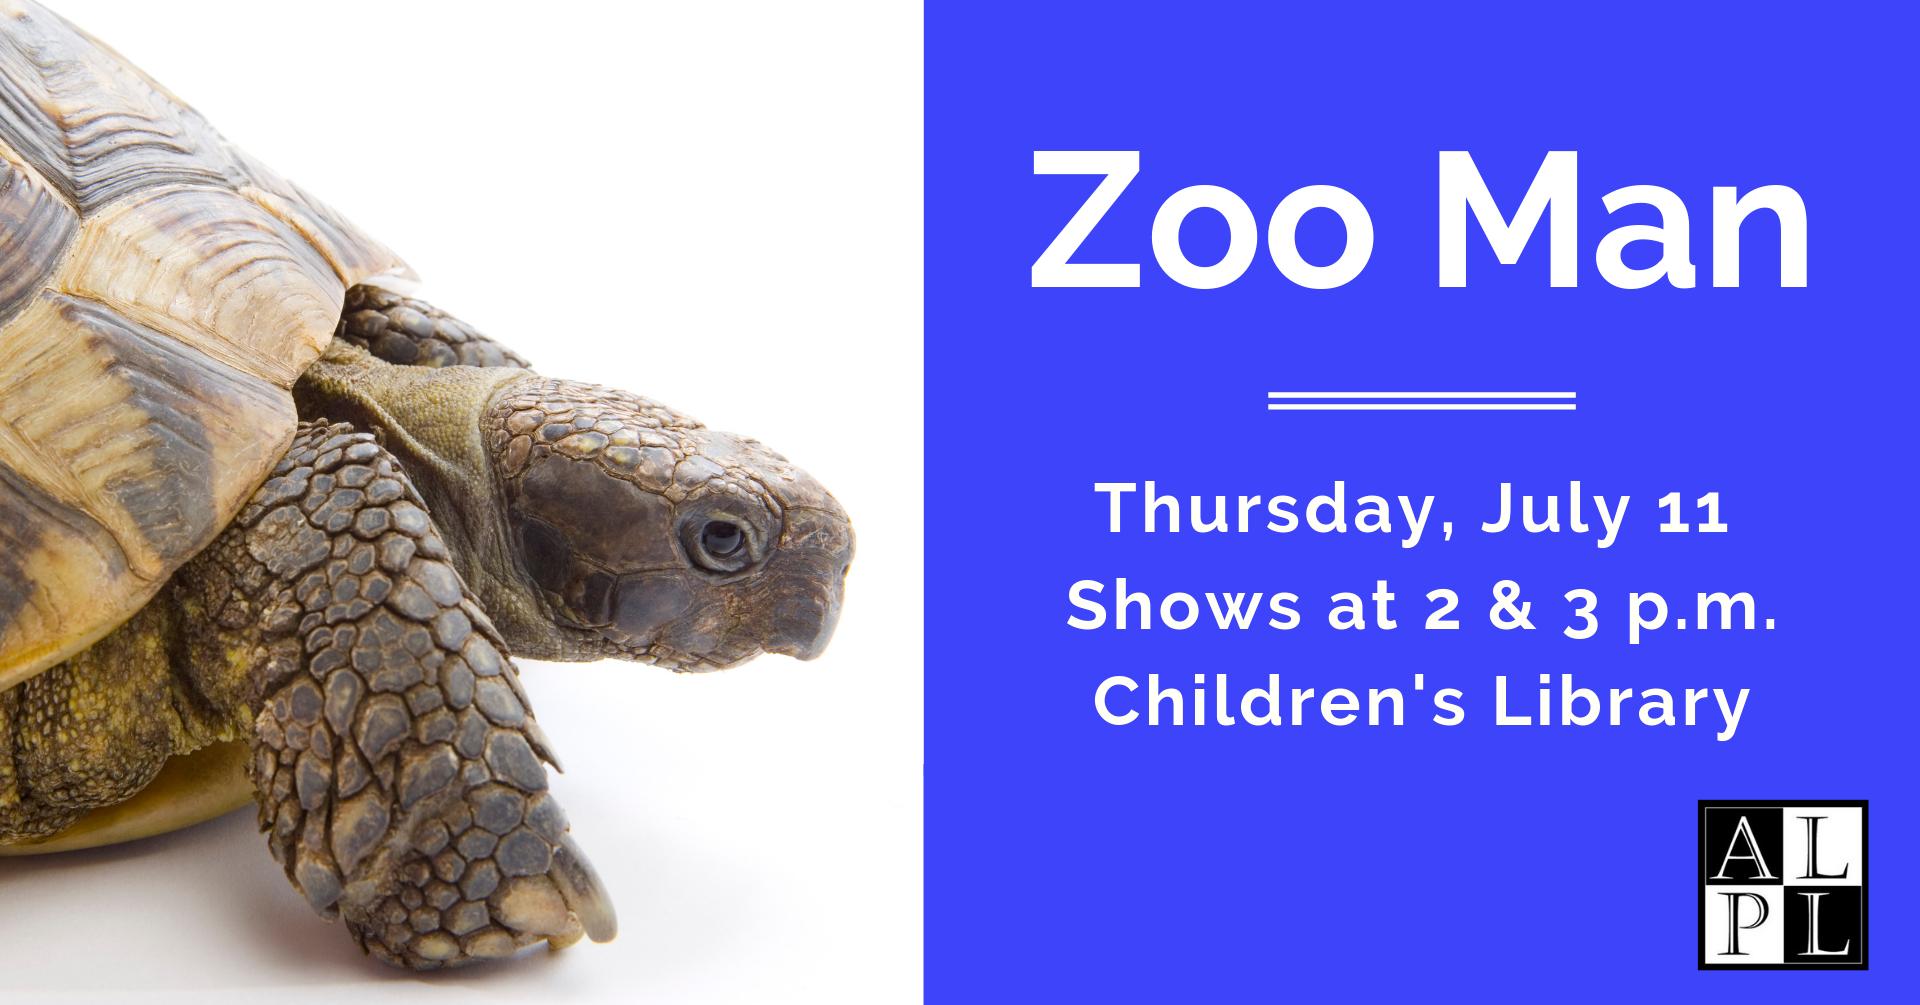 Facebook Event - Zoo Man